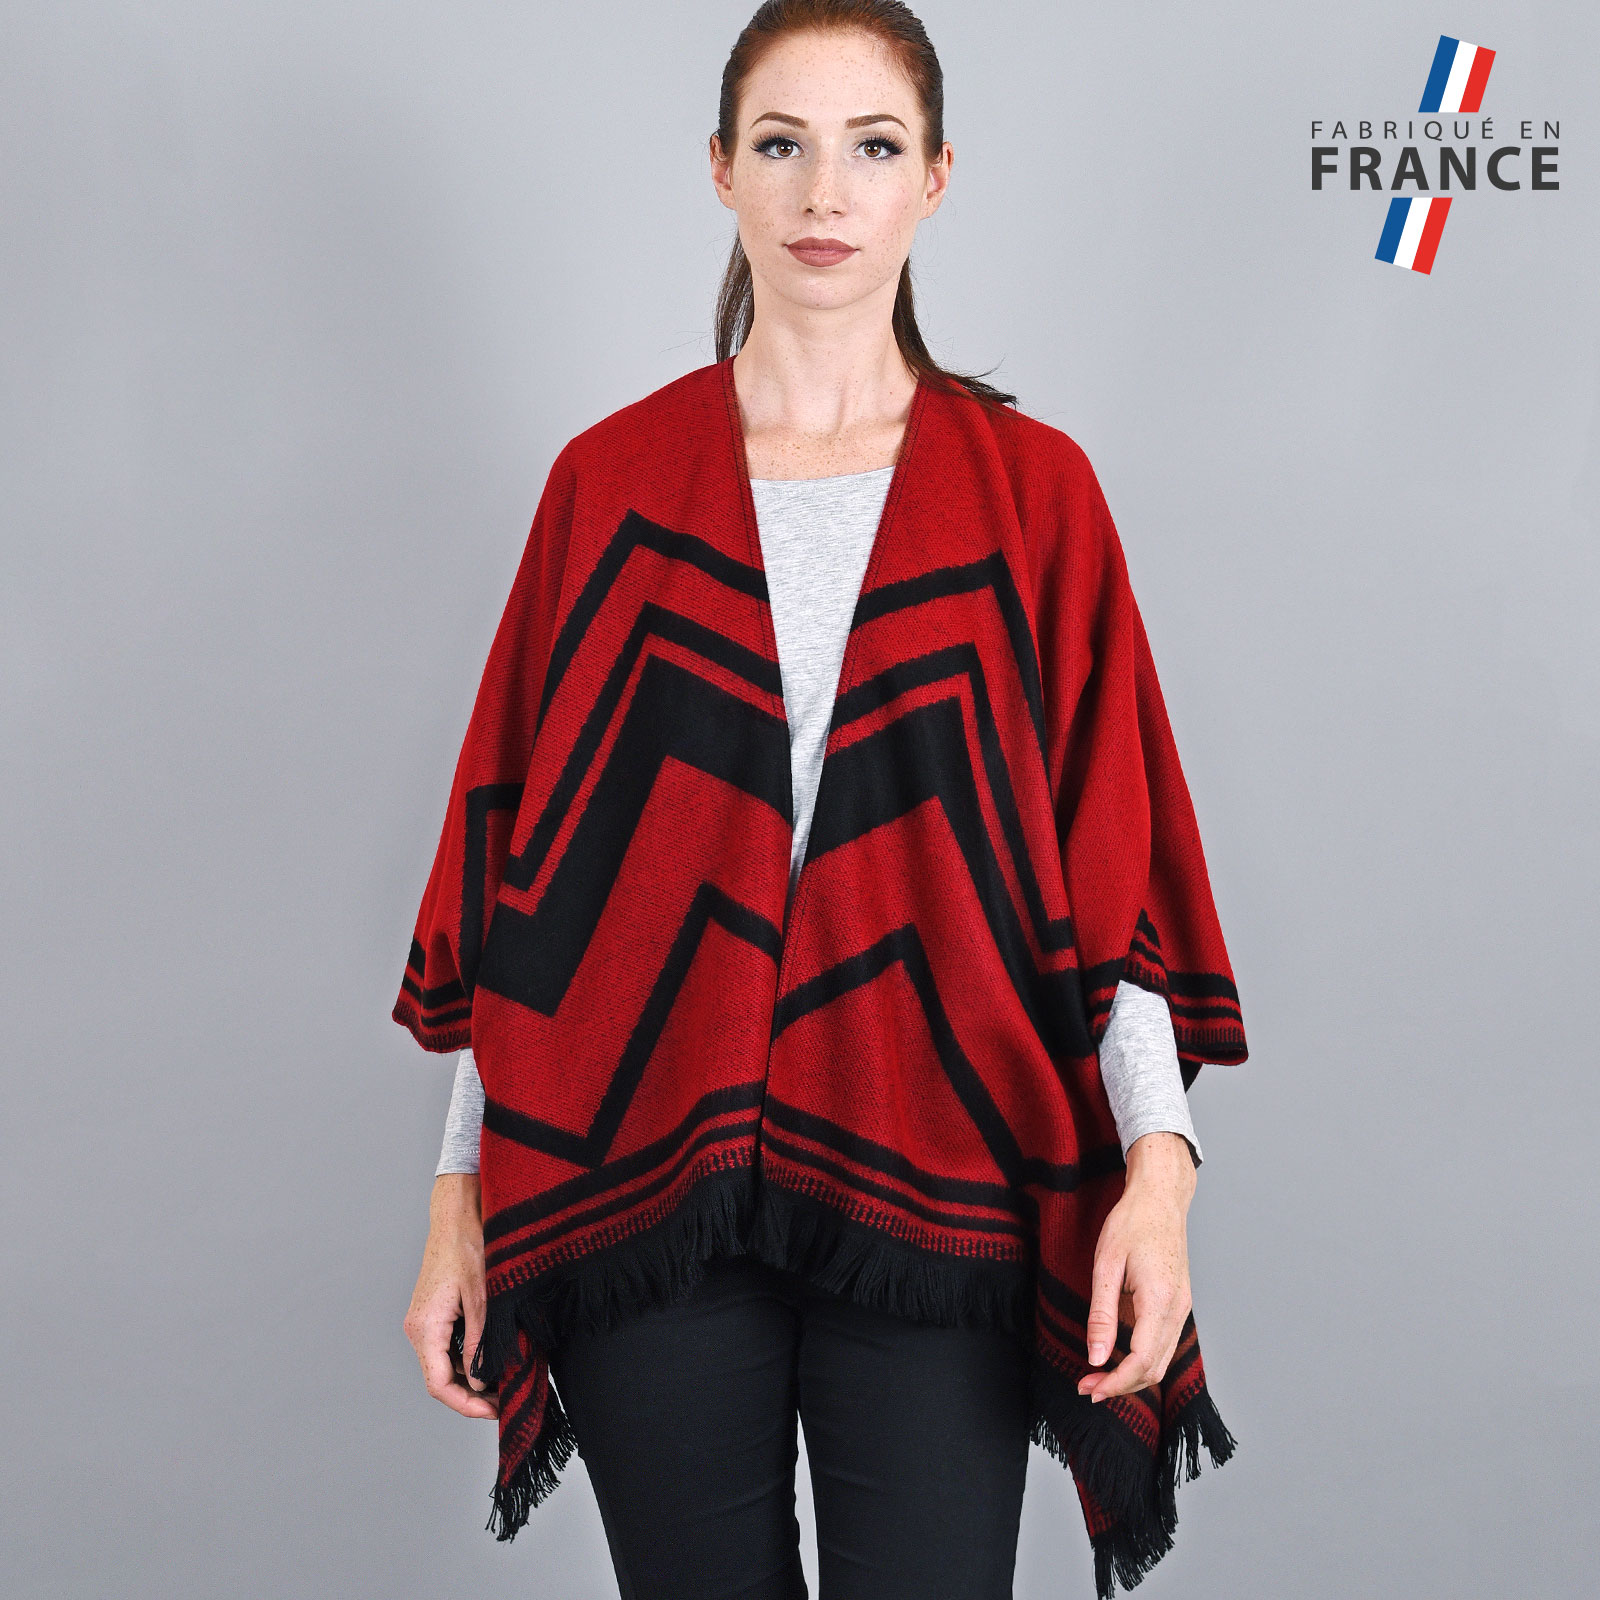 AT-04155-VF16-LB_FR-poncho-femme-azteque-rouge